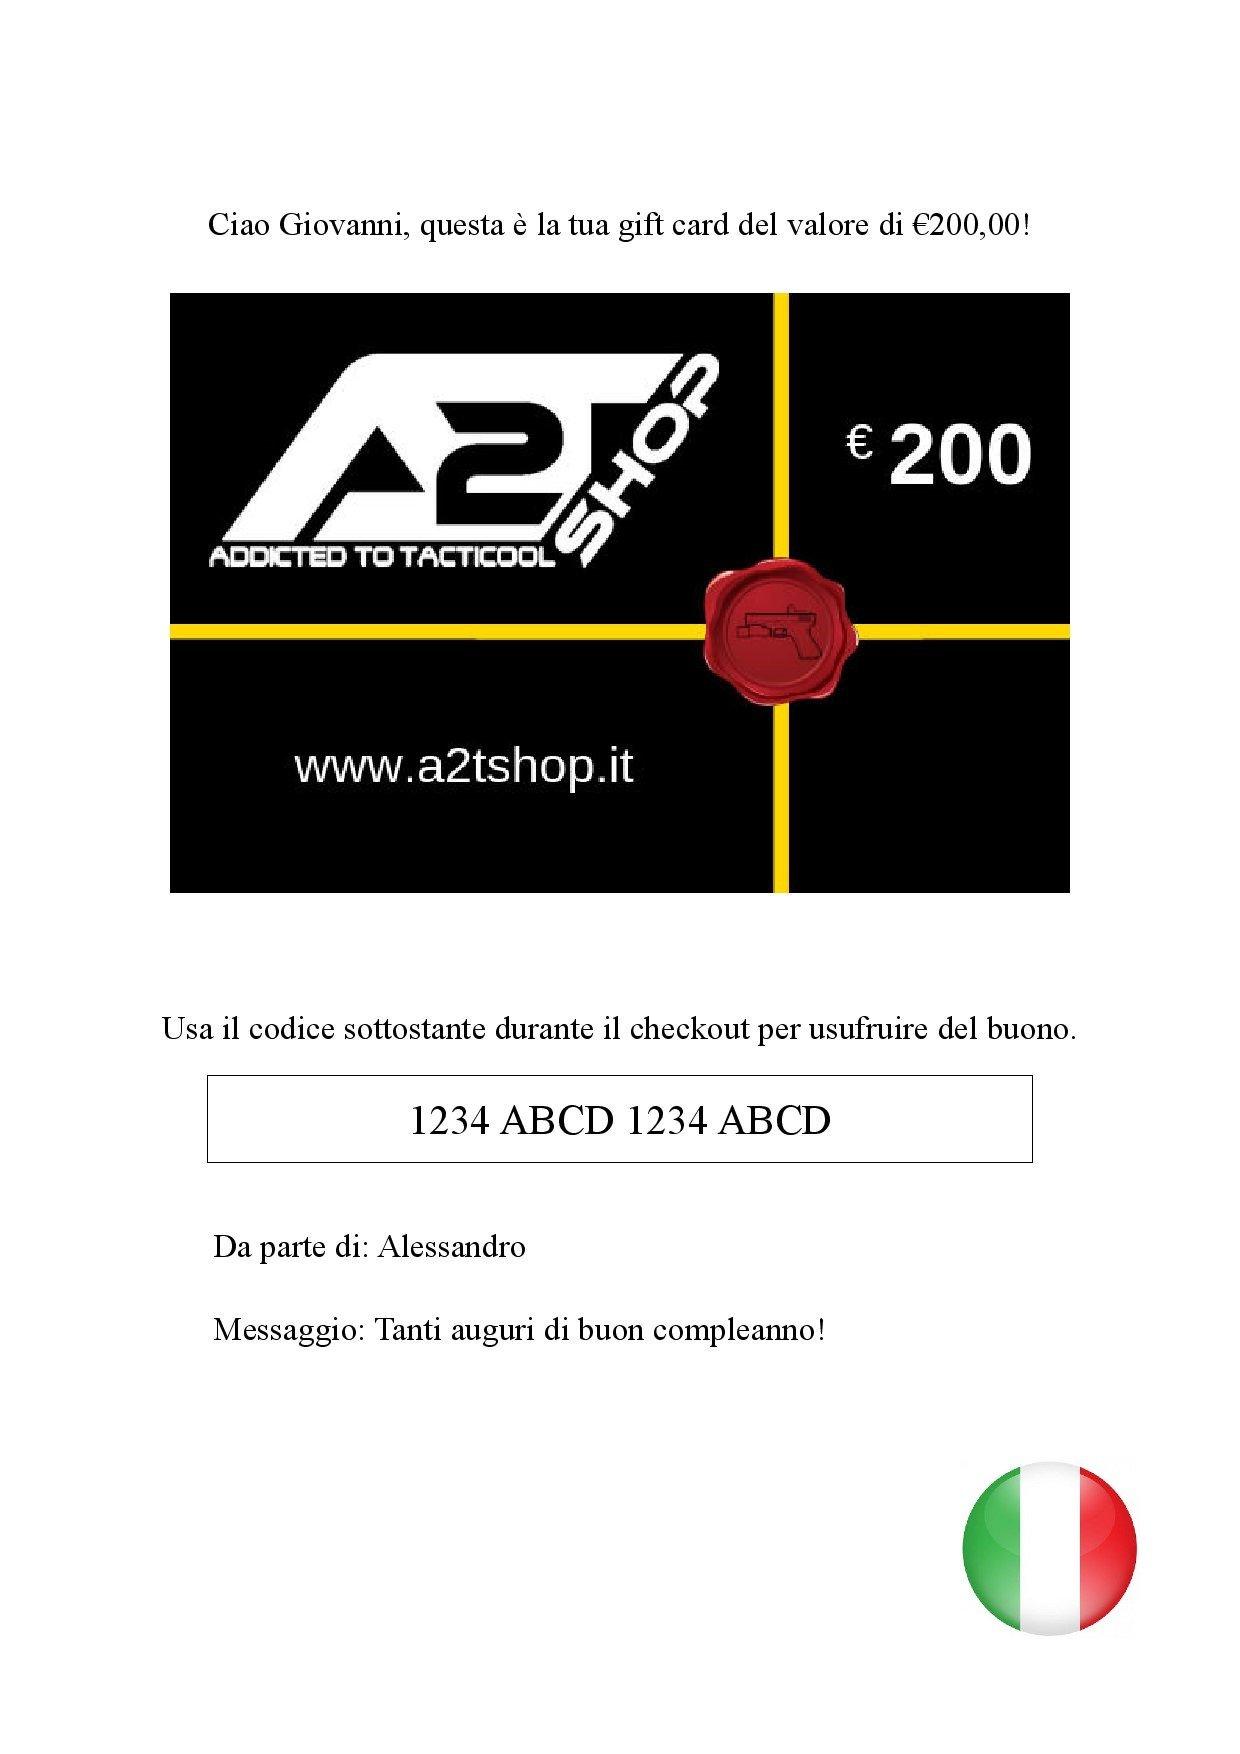 A2t Shop E Gift Card A2t Shop